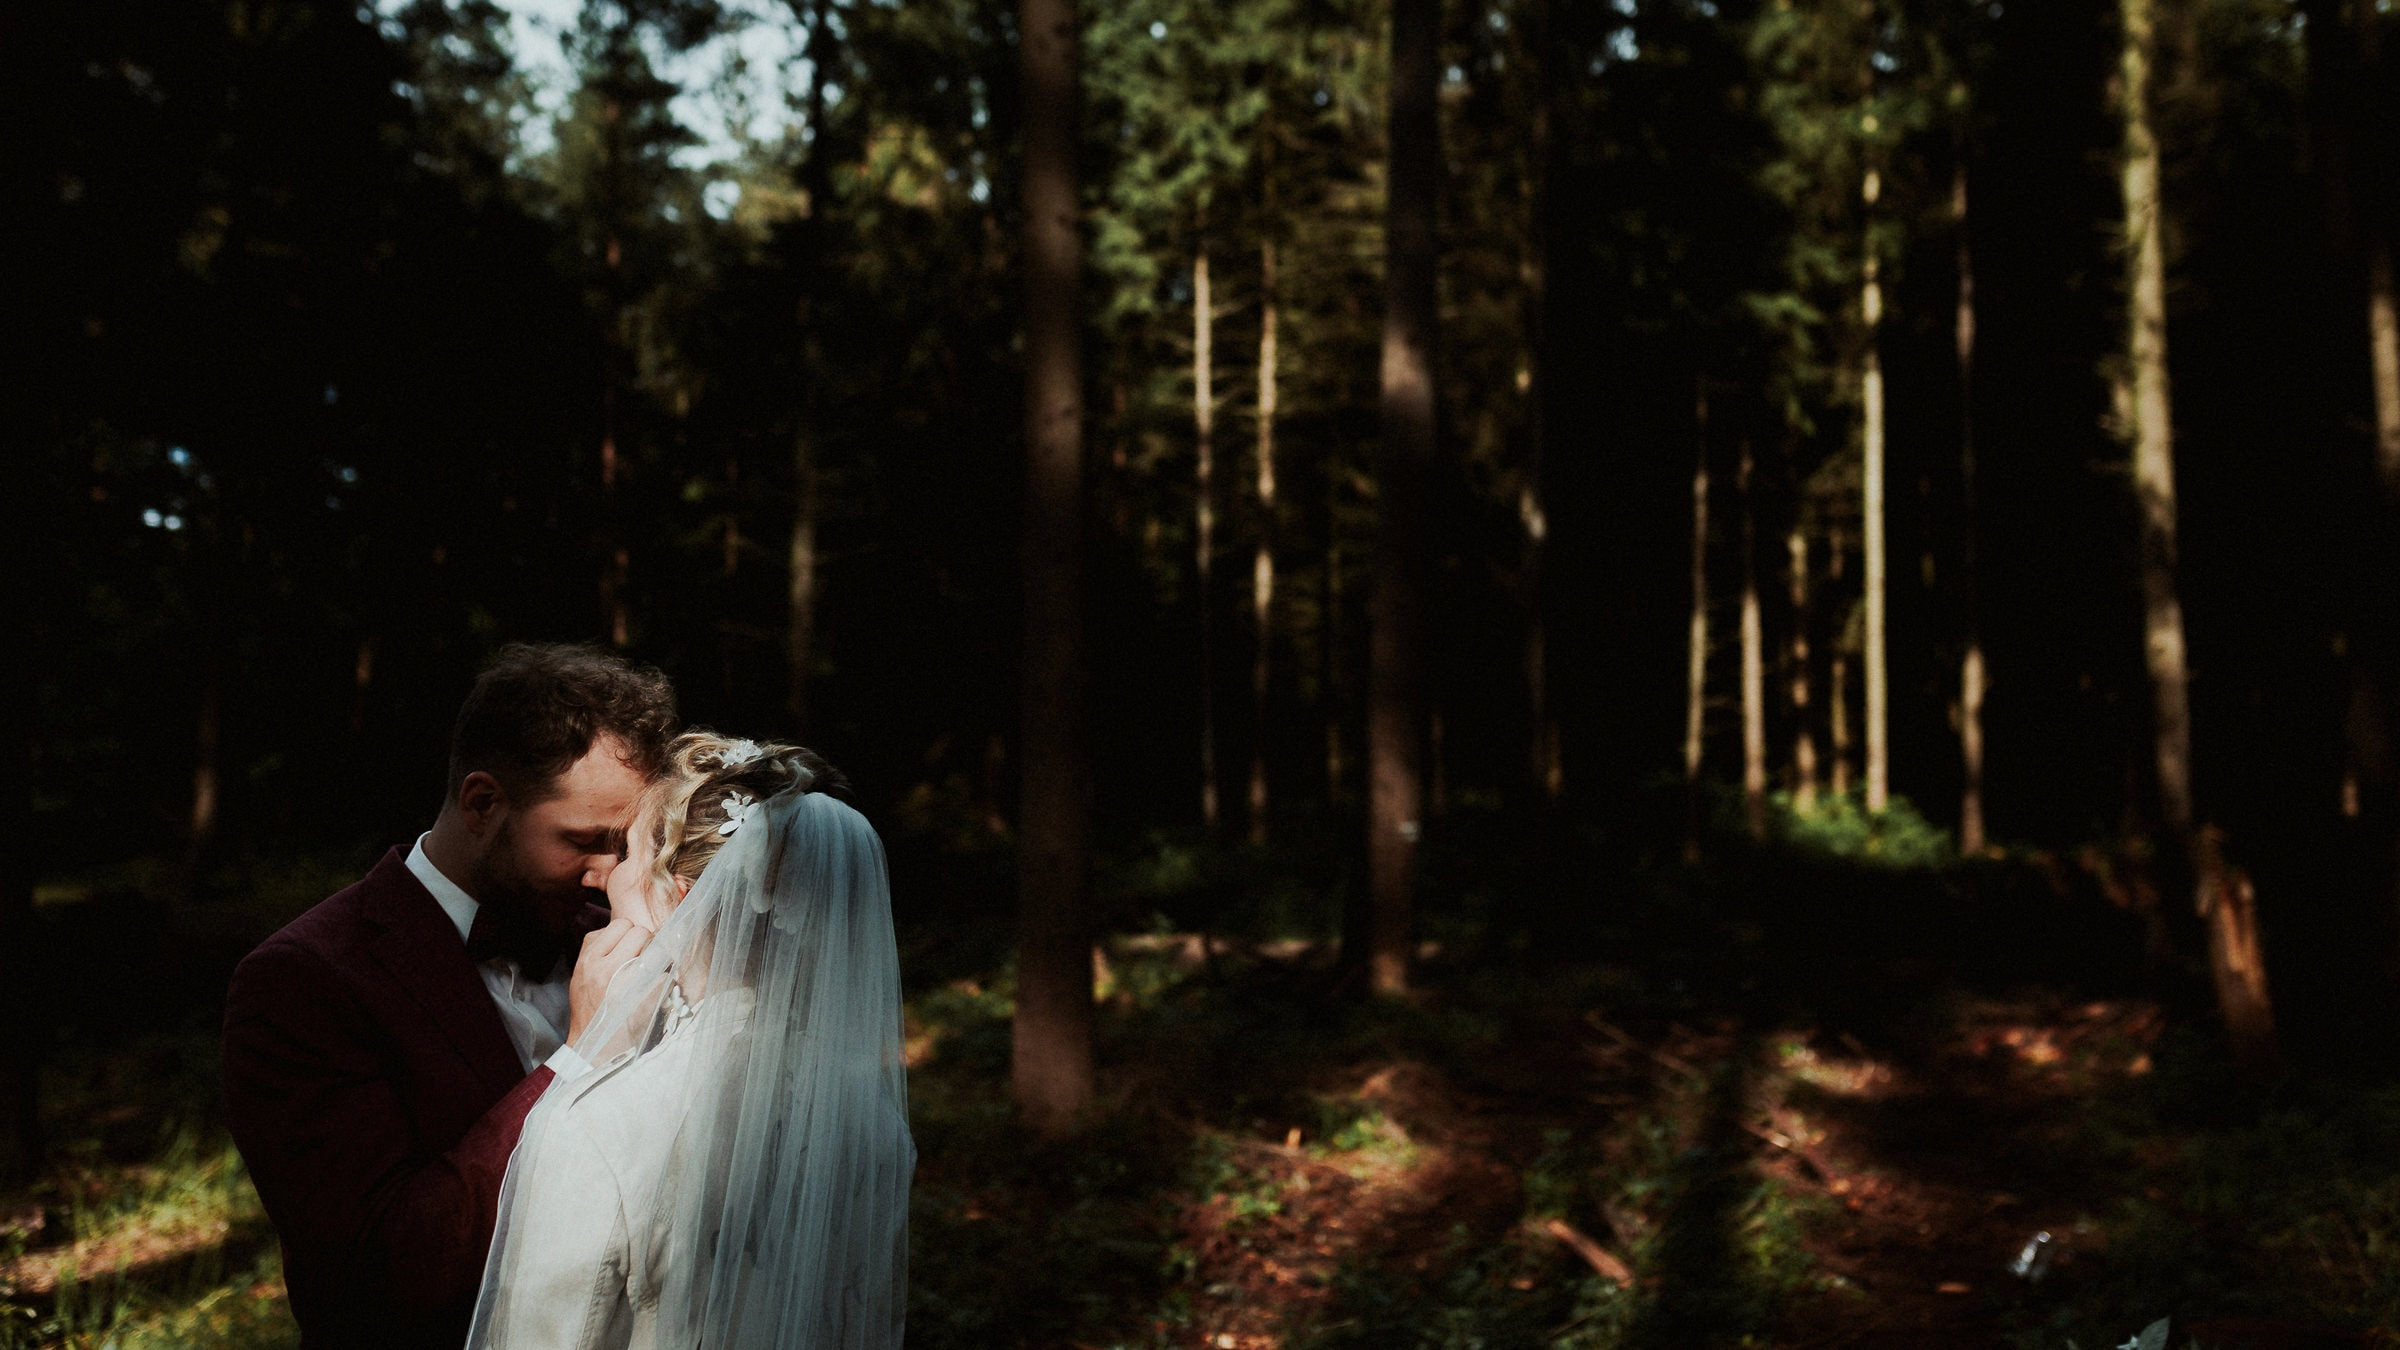 Hochzeitsfotograf Hamburg Waldhof Moelln 0018